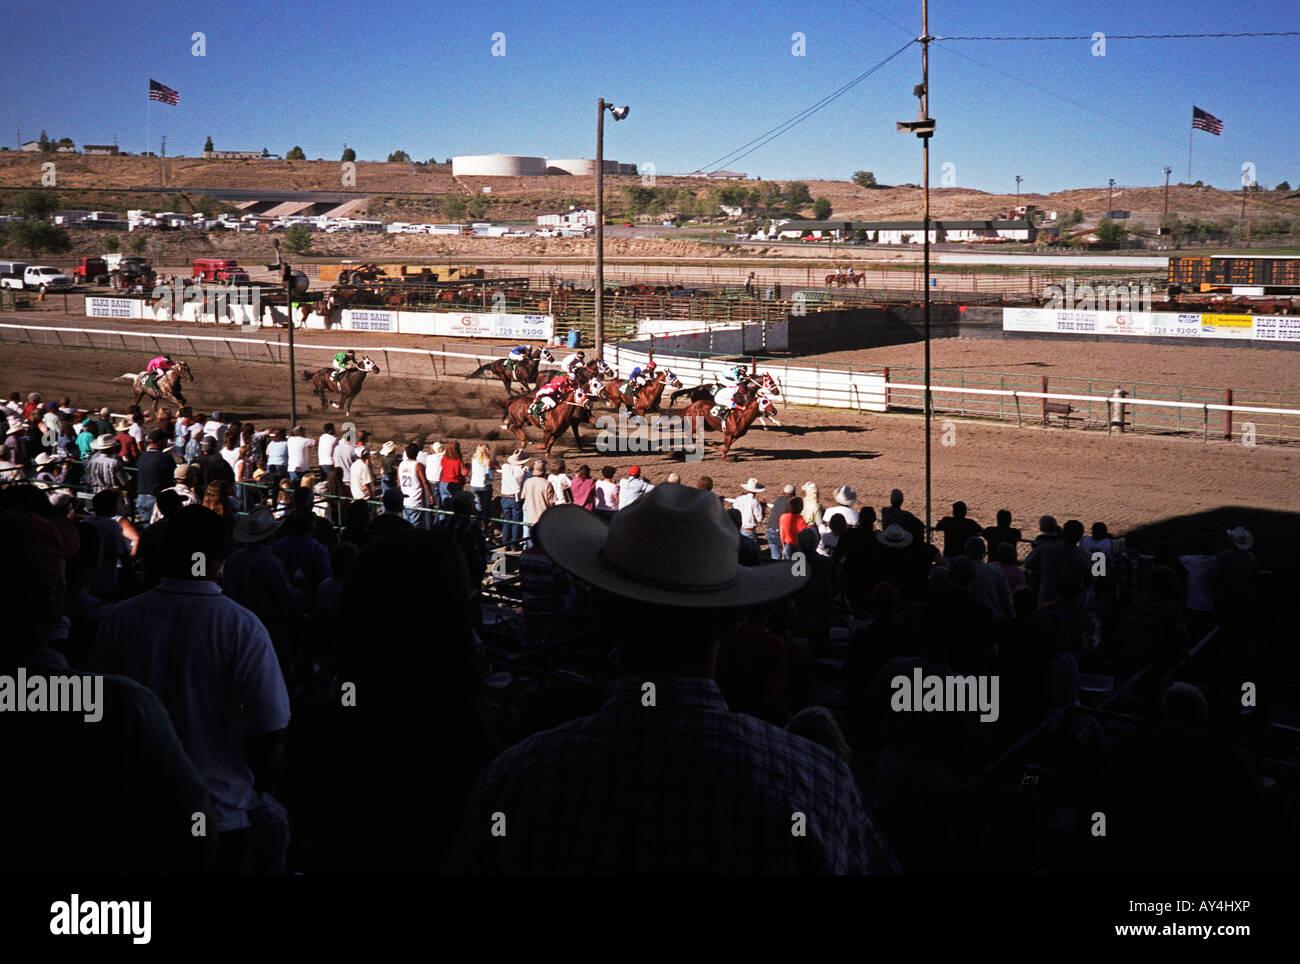 Horse racing event, Elko County Fair, Nevada, USA - Stock Image